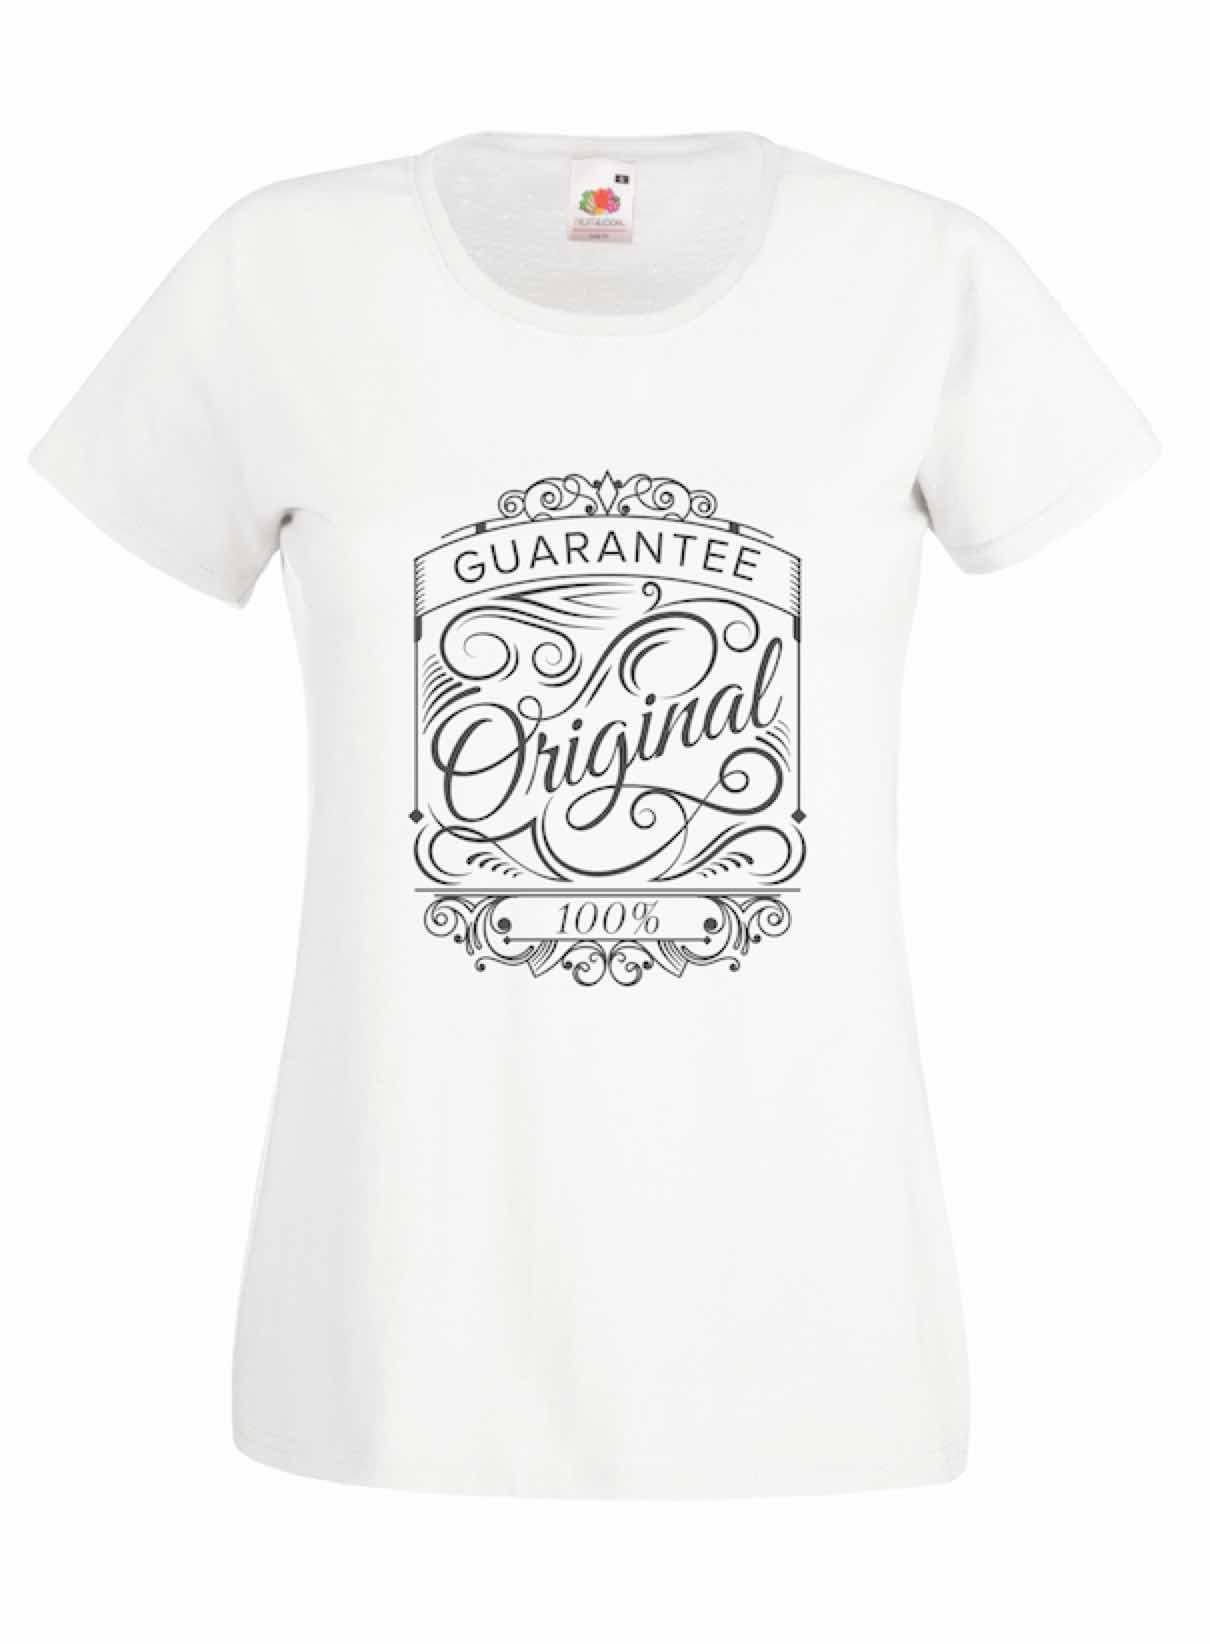 Original design for t-shirt, hoodie & sweatshirt